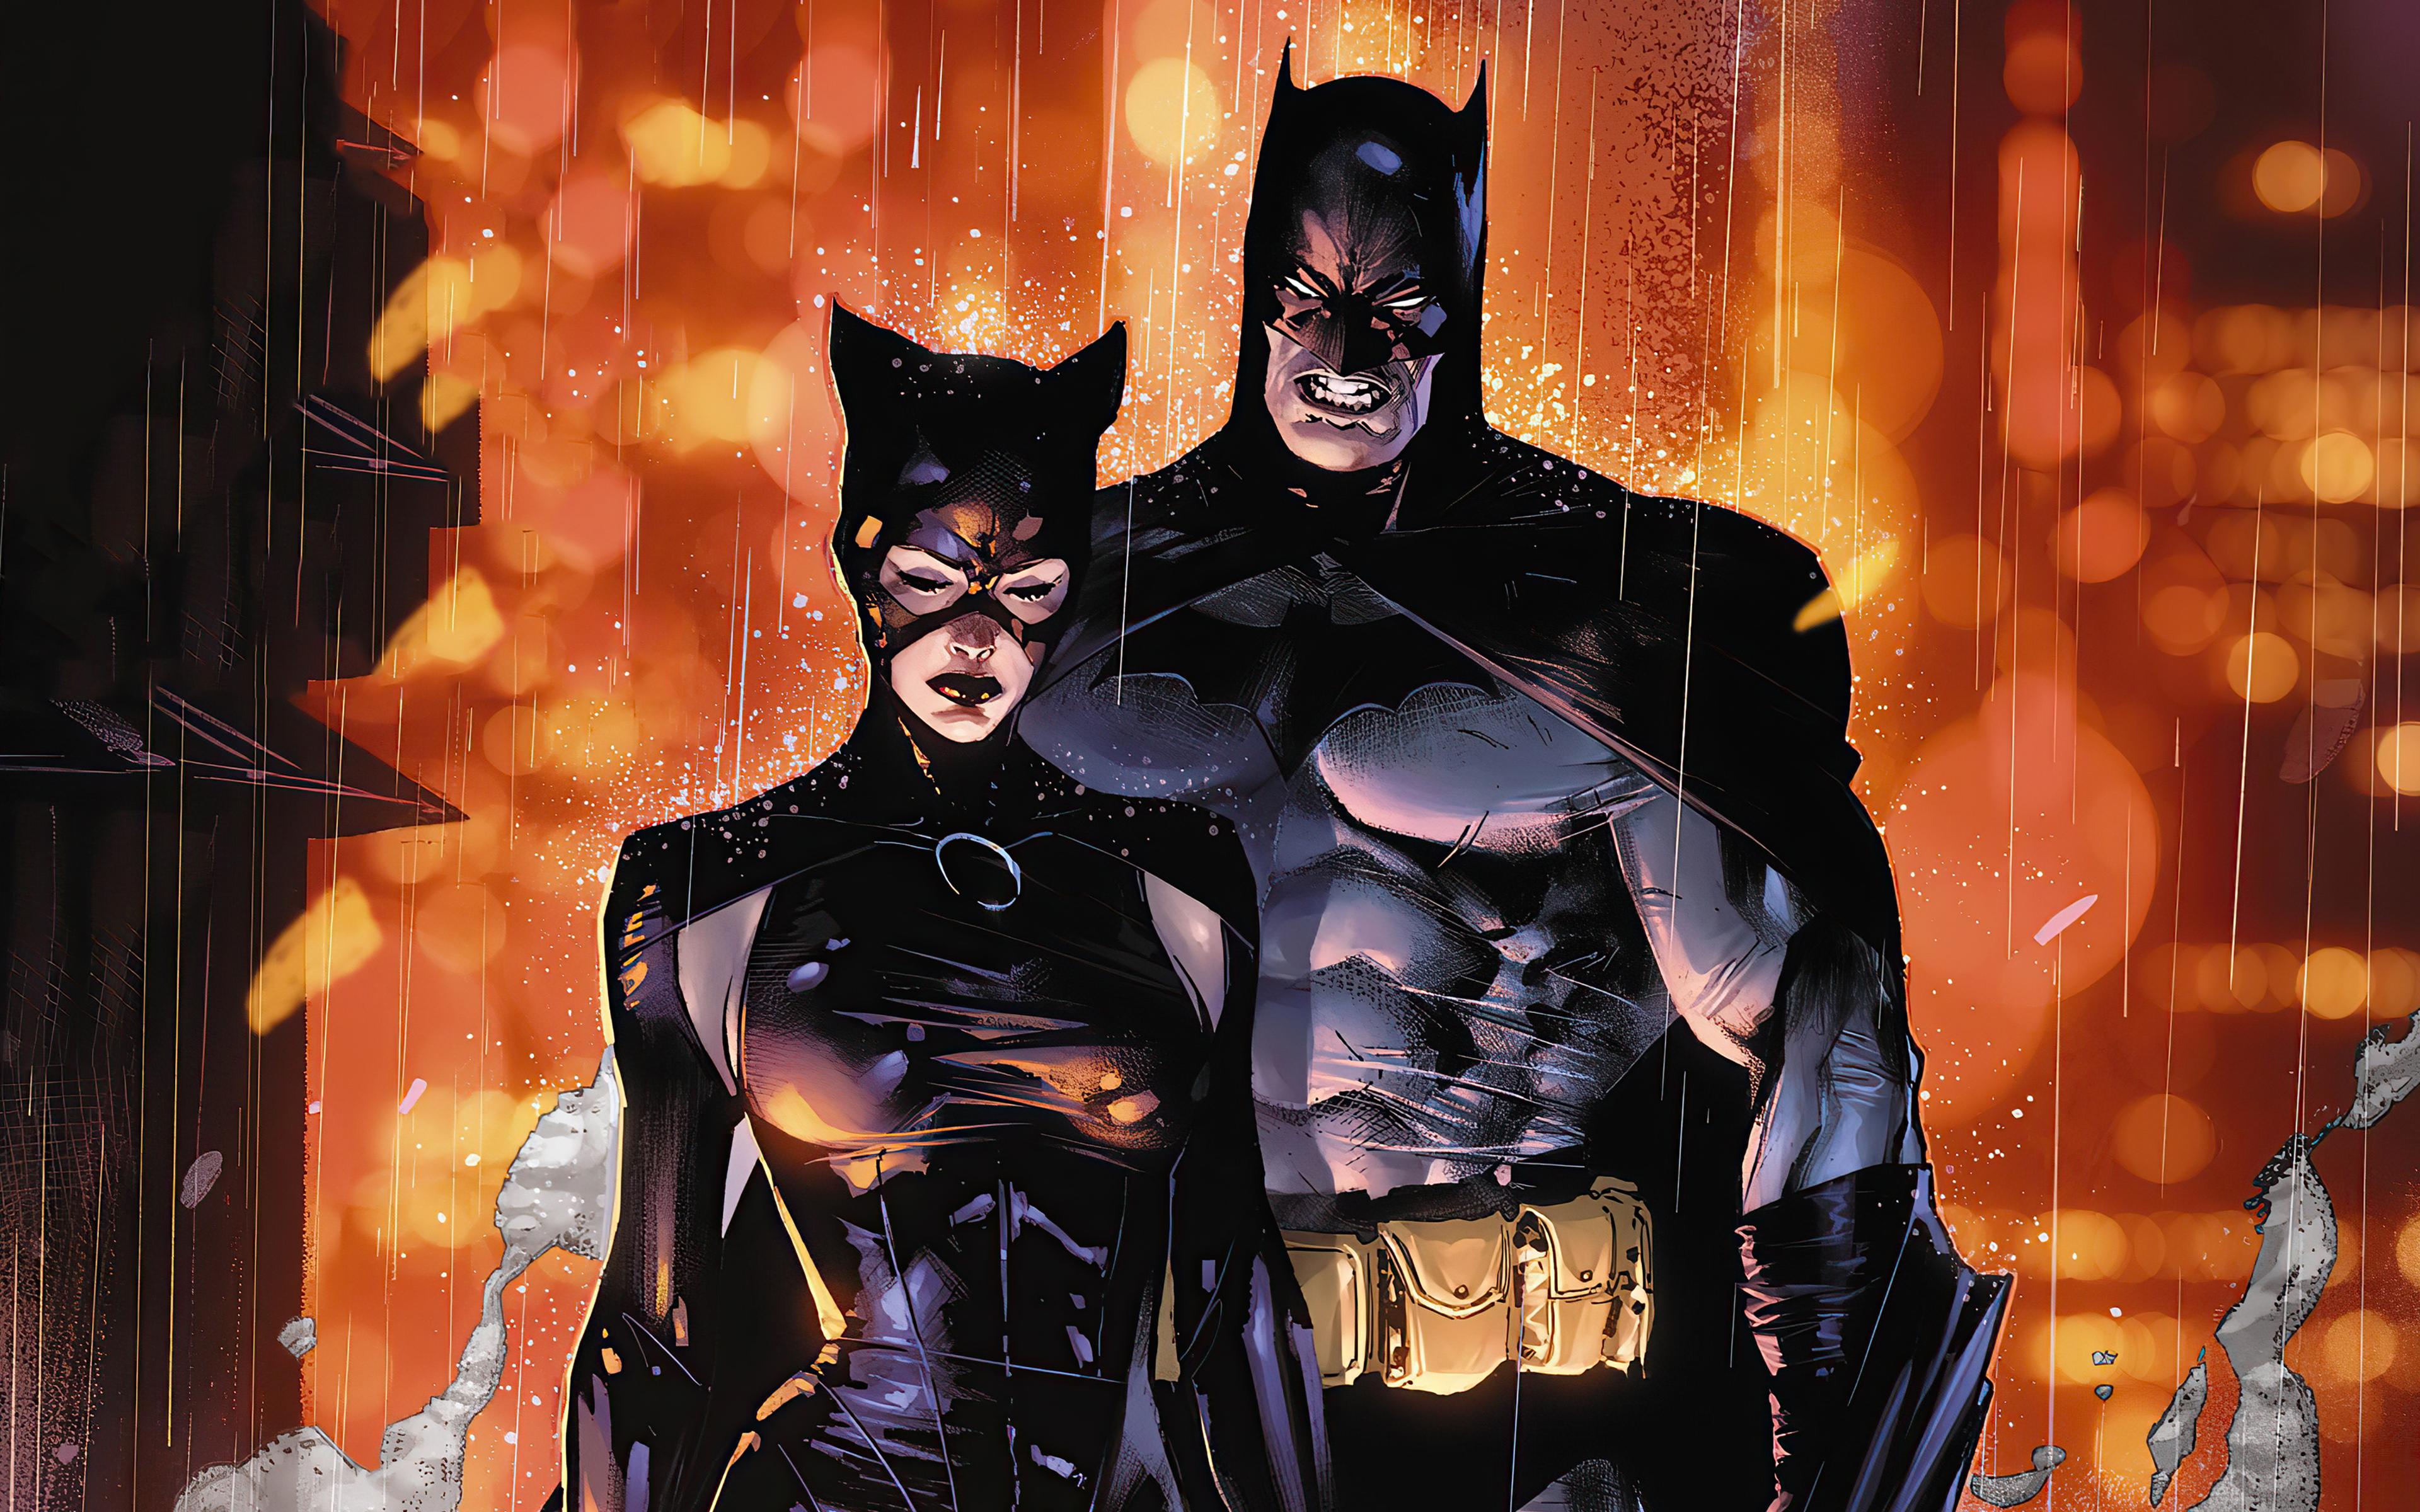 angry-batman-and-catwoman-4k-j5.jpg